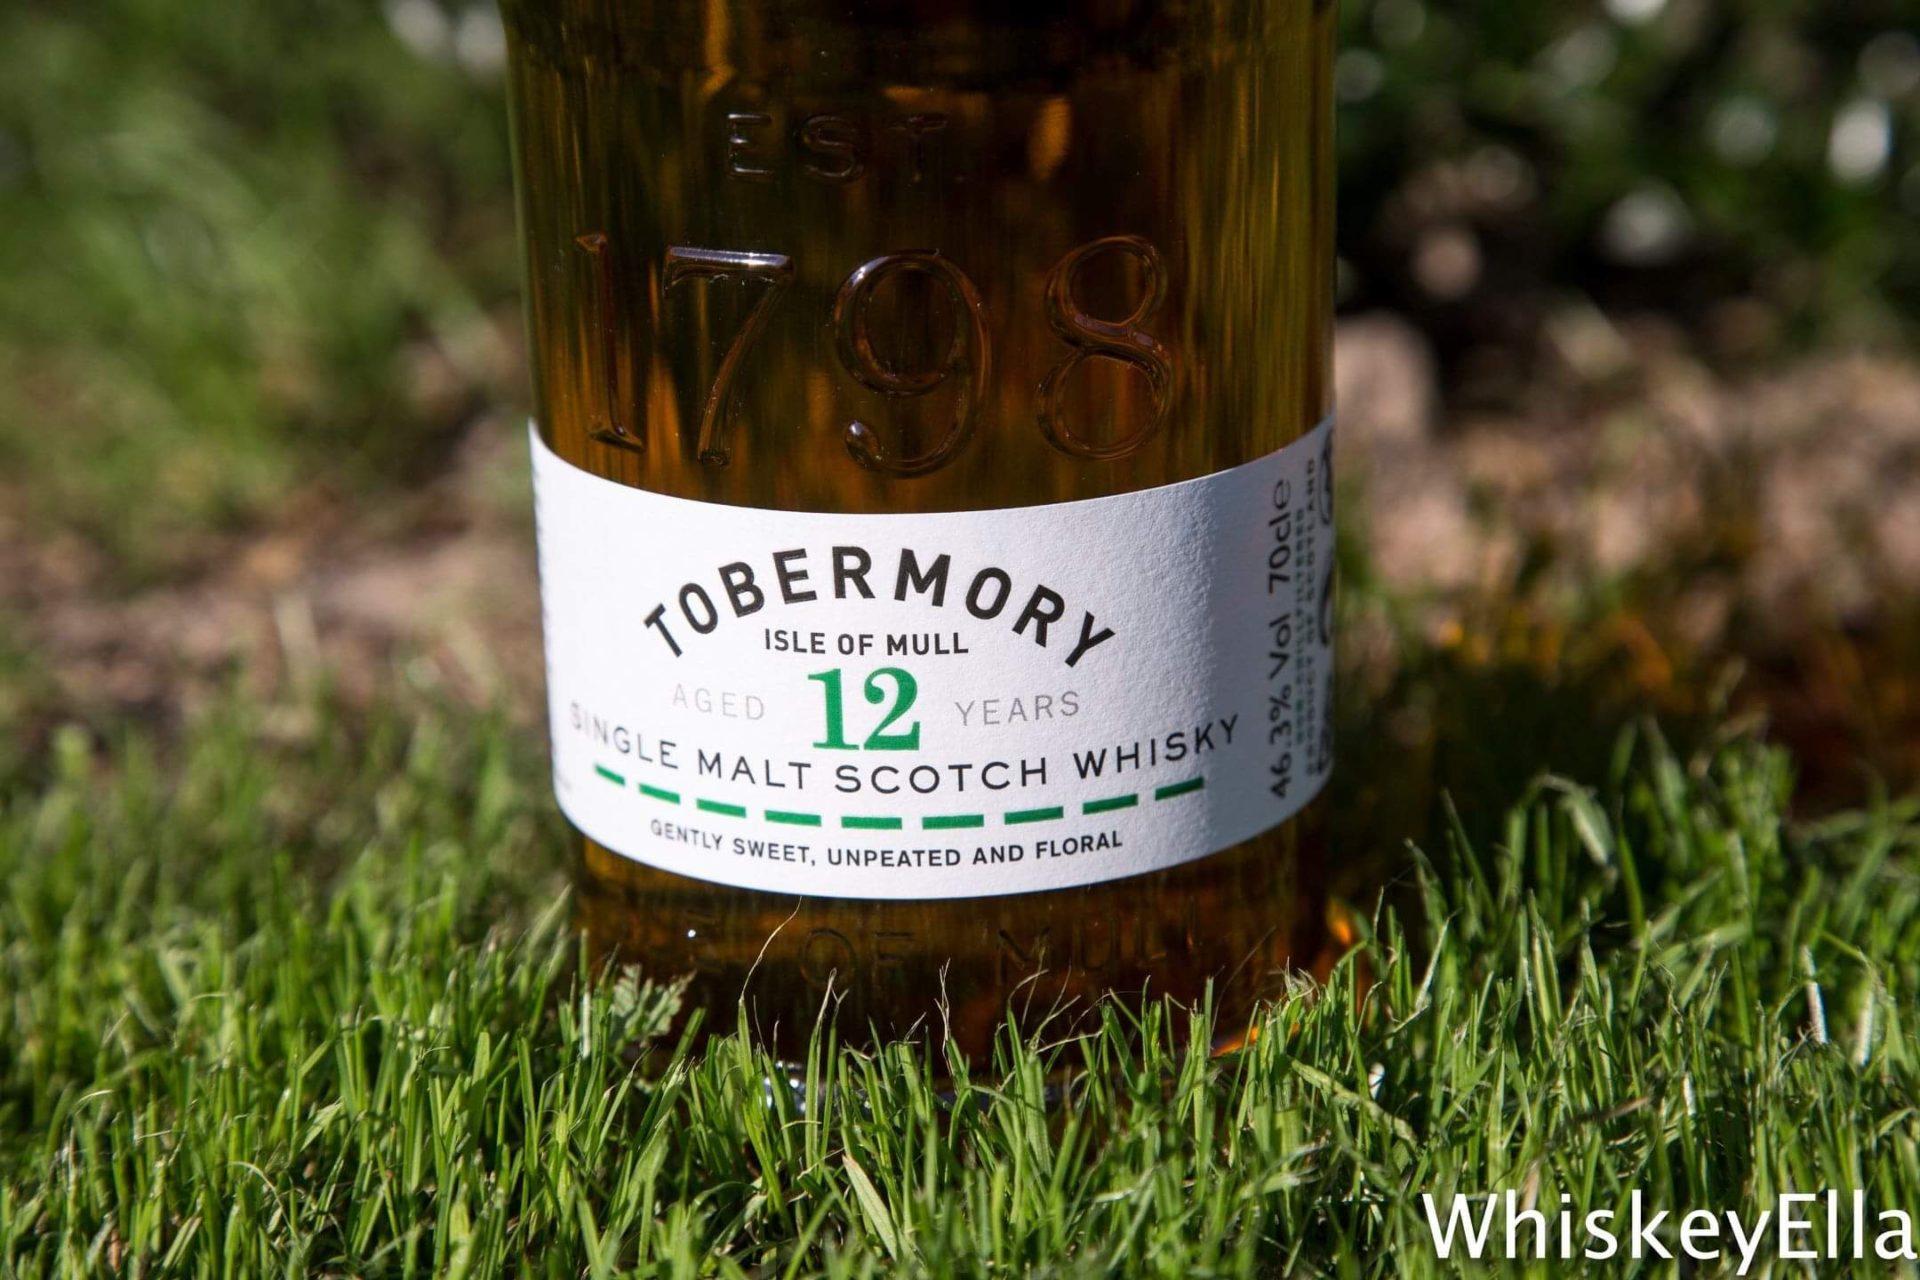 Nasza recenzja Tobermory 12 yo #23